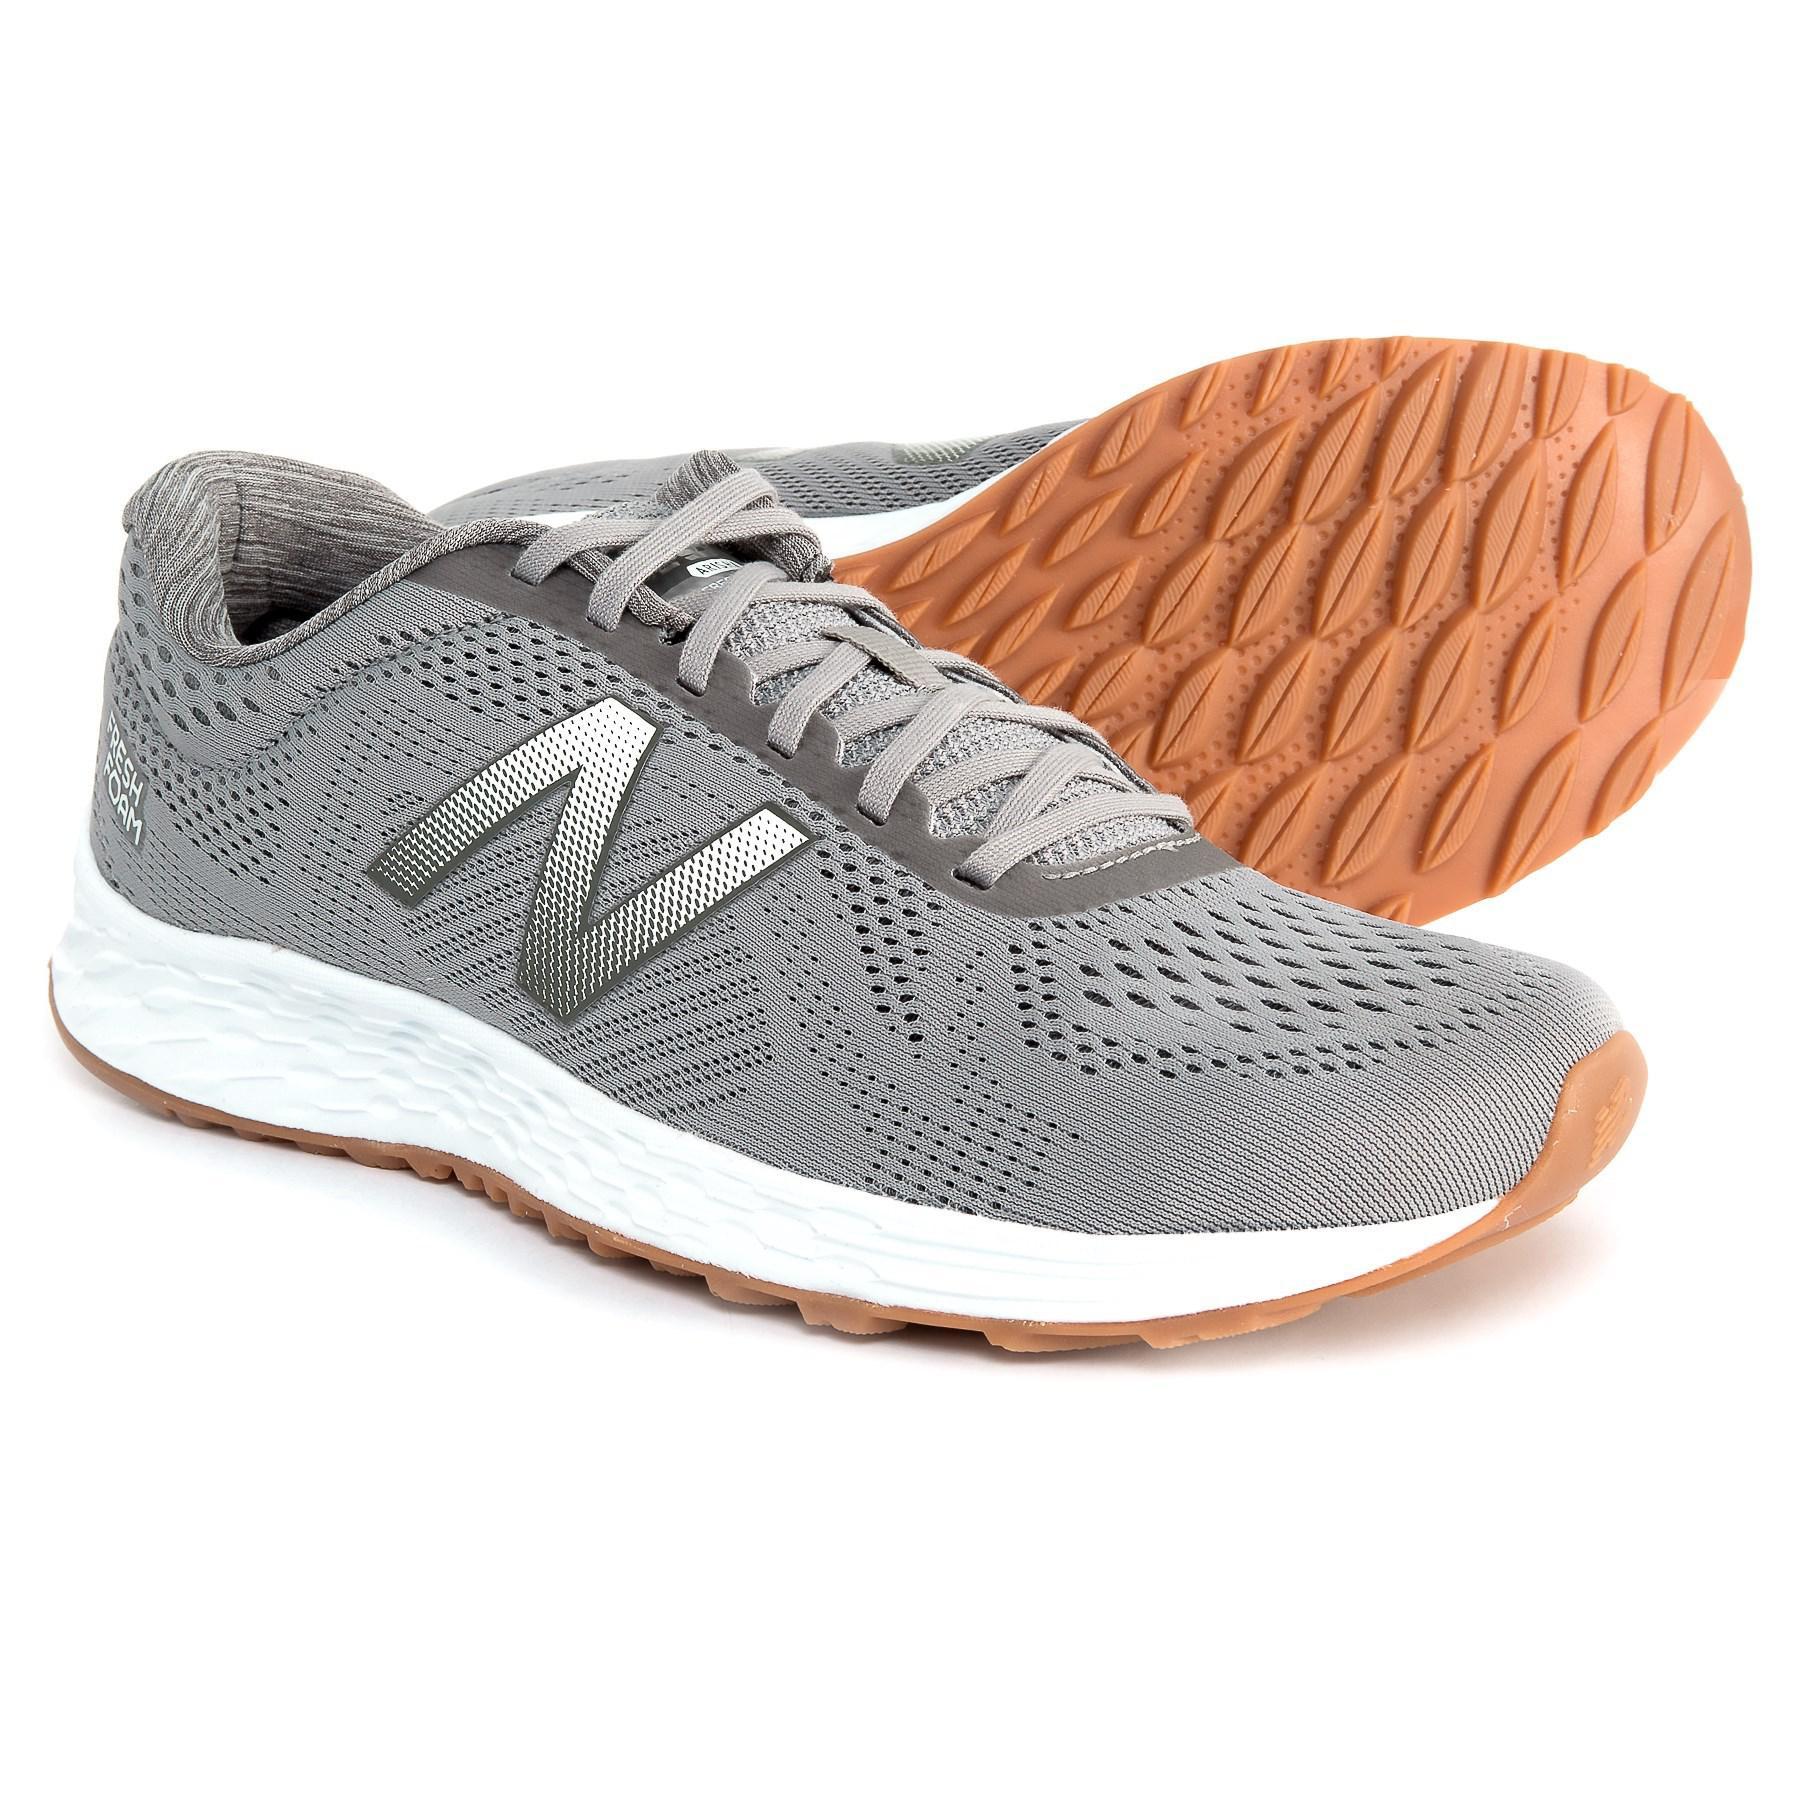 Footwear New Balance Mens Arishi V1